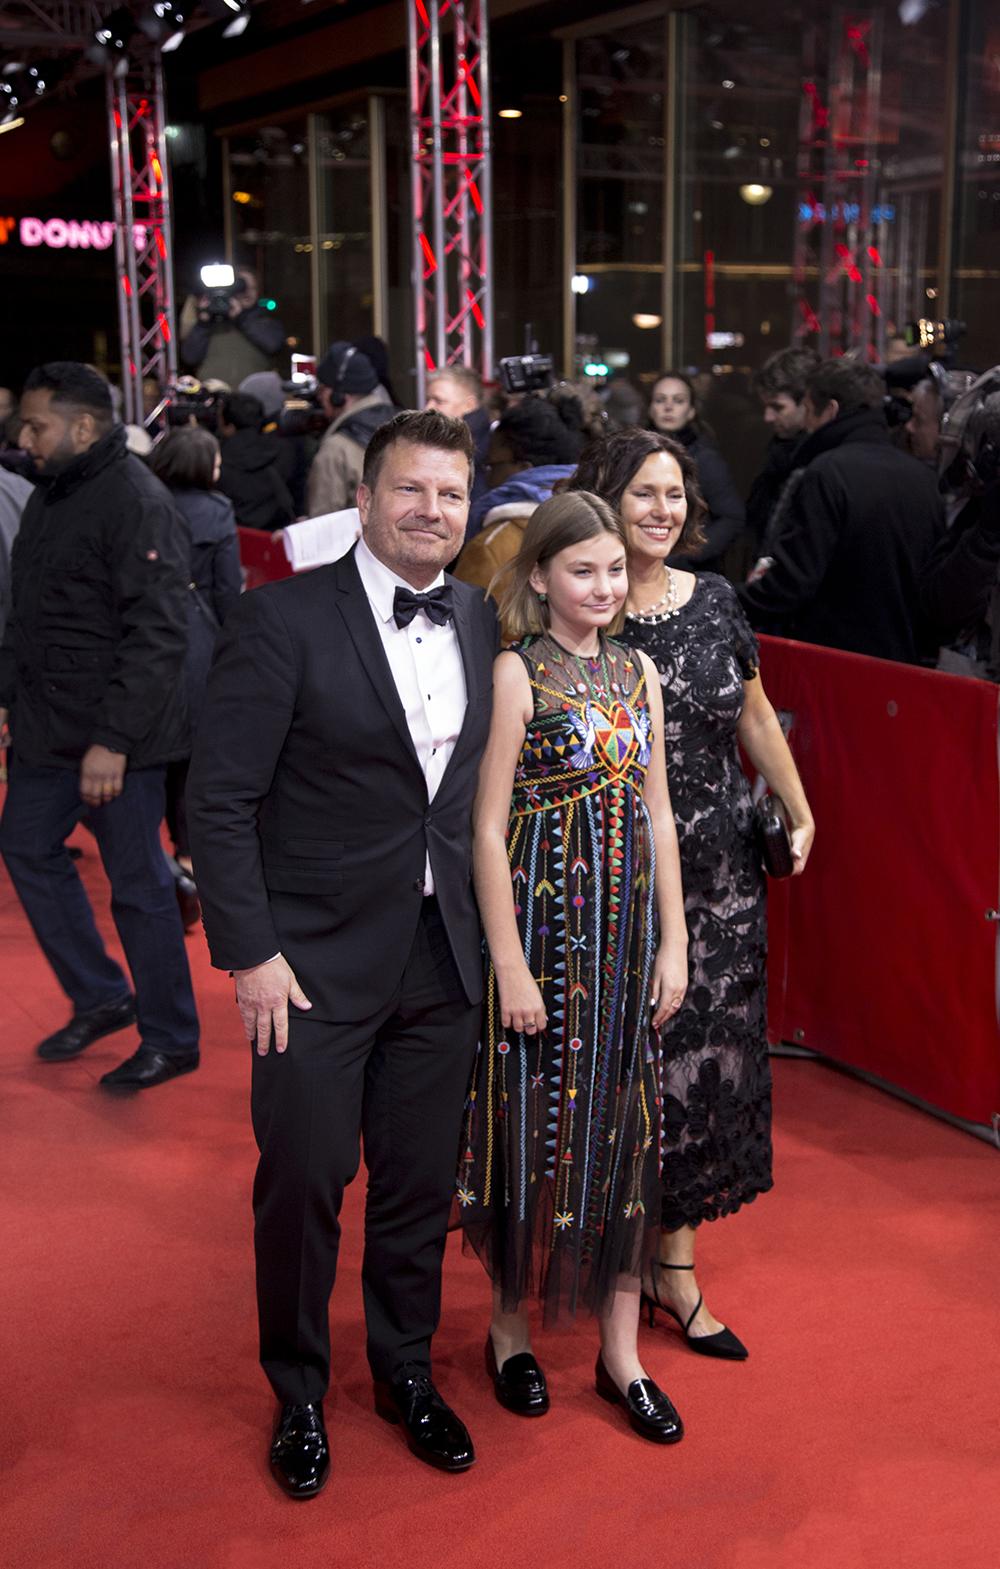 glumica Anna Pniowsky sa roditeljima / foto_Senka Ćatić/Spektroom/FBL